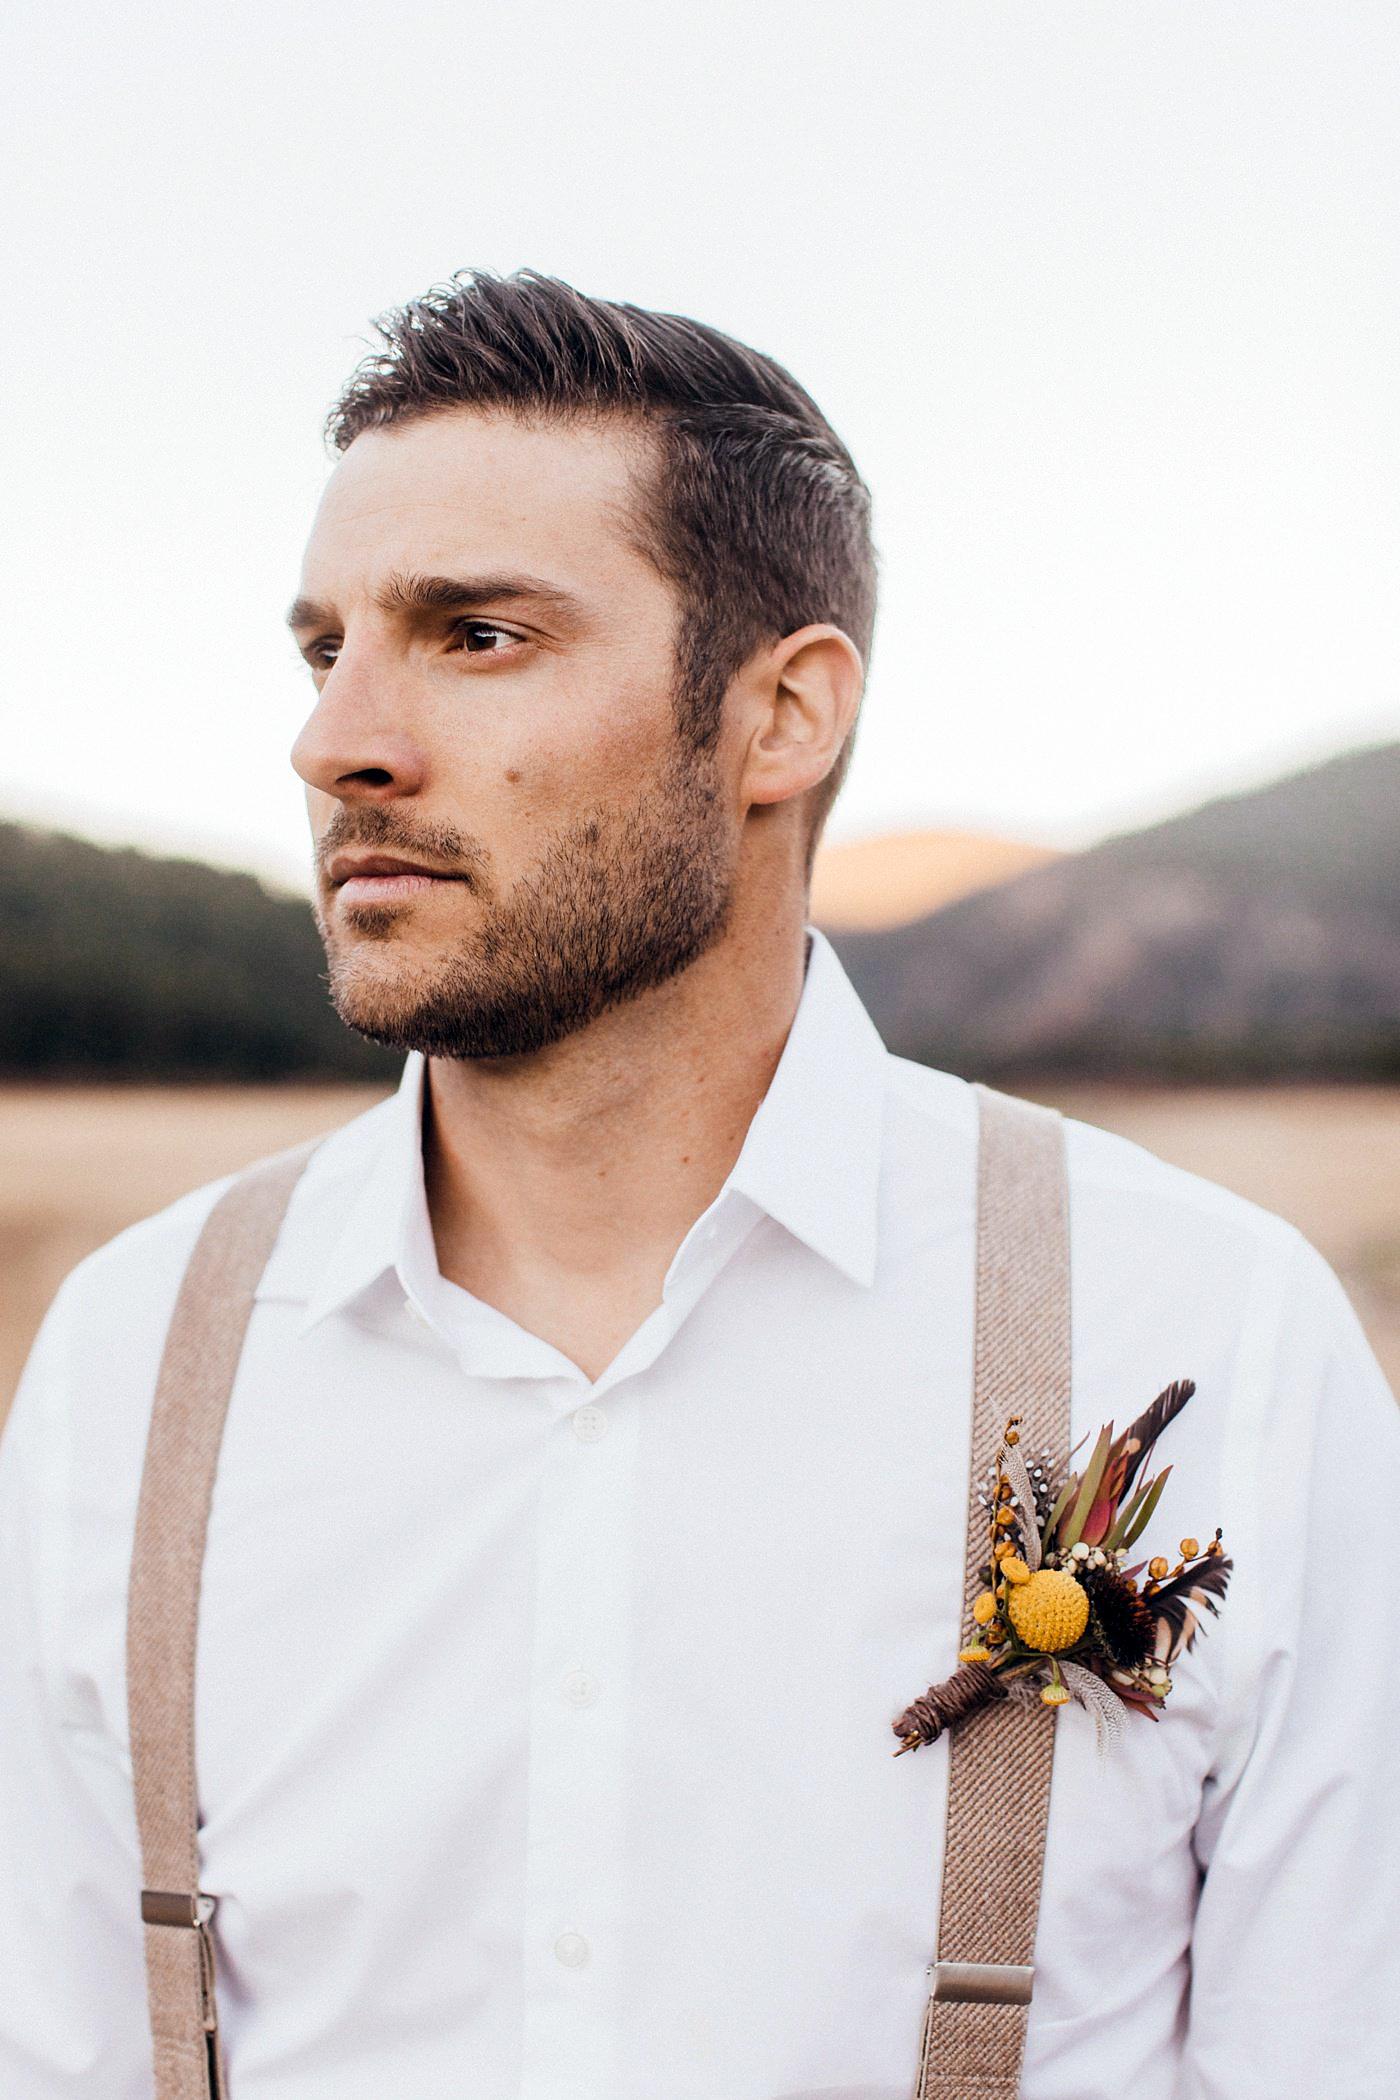 Becca Kufrin Garrett Yrigoyen Pre-Wedding Shoot - Yrigoyen looked dapper as ever in a crisp white shirt and suspenders.